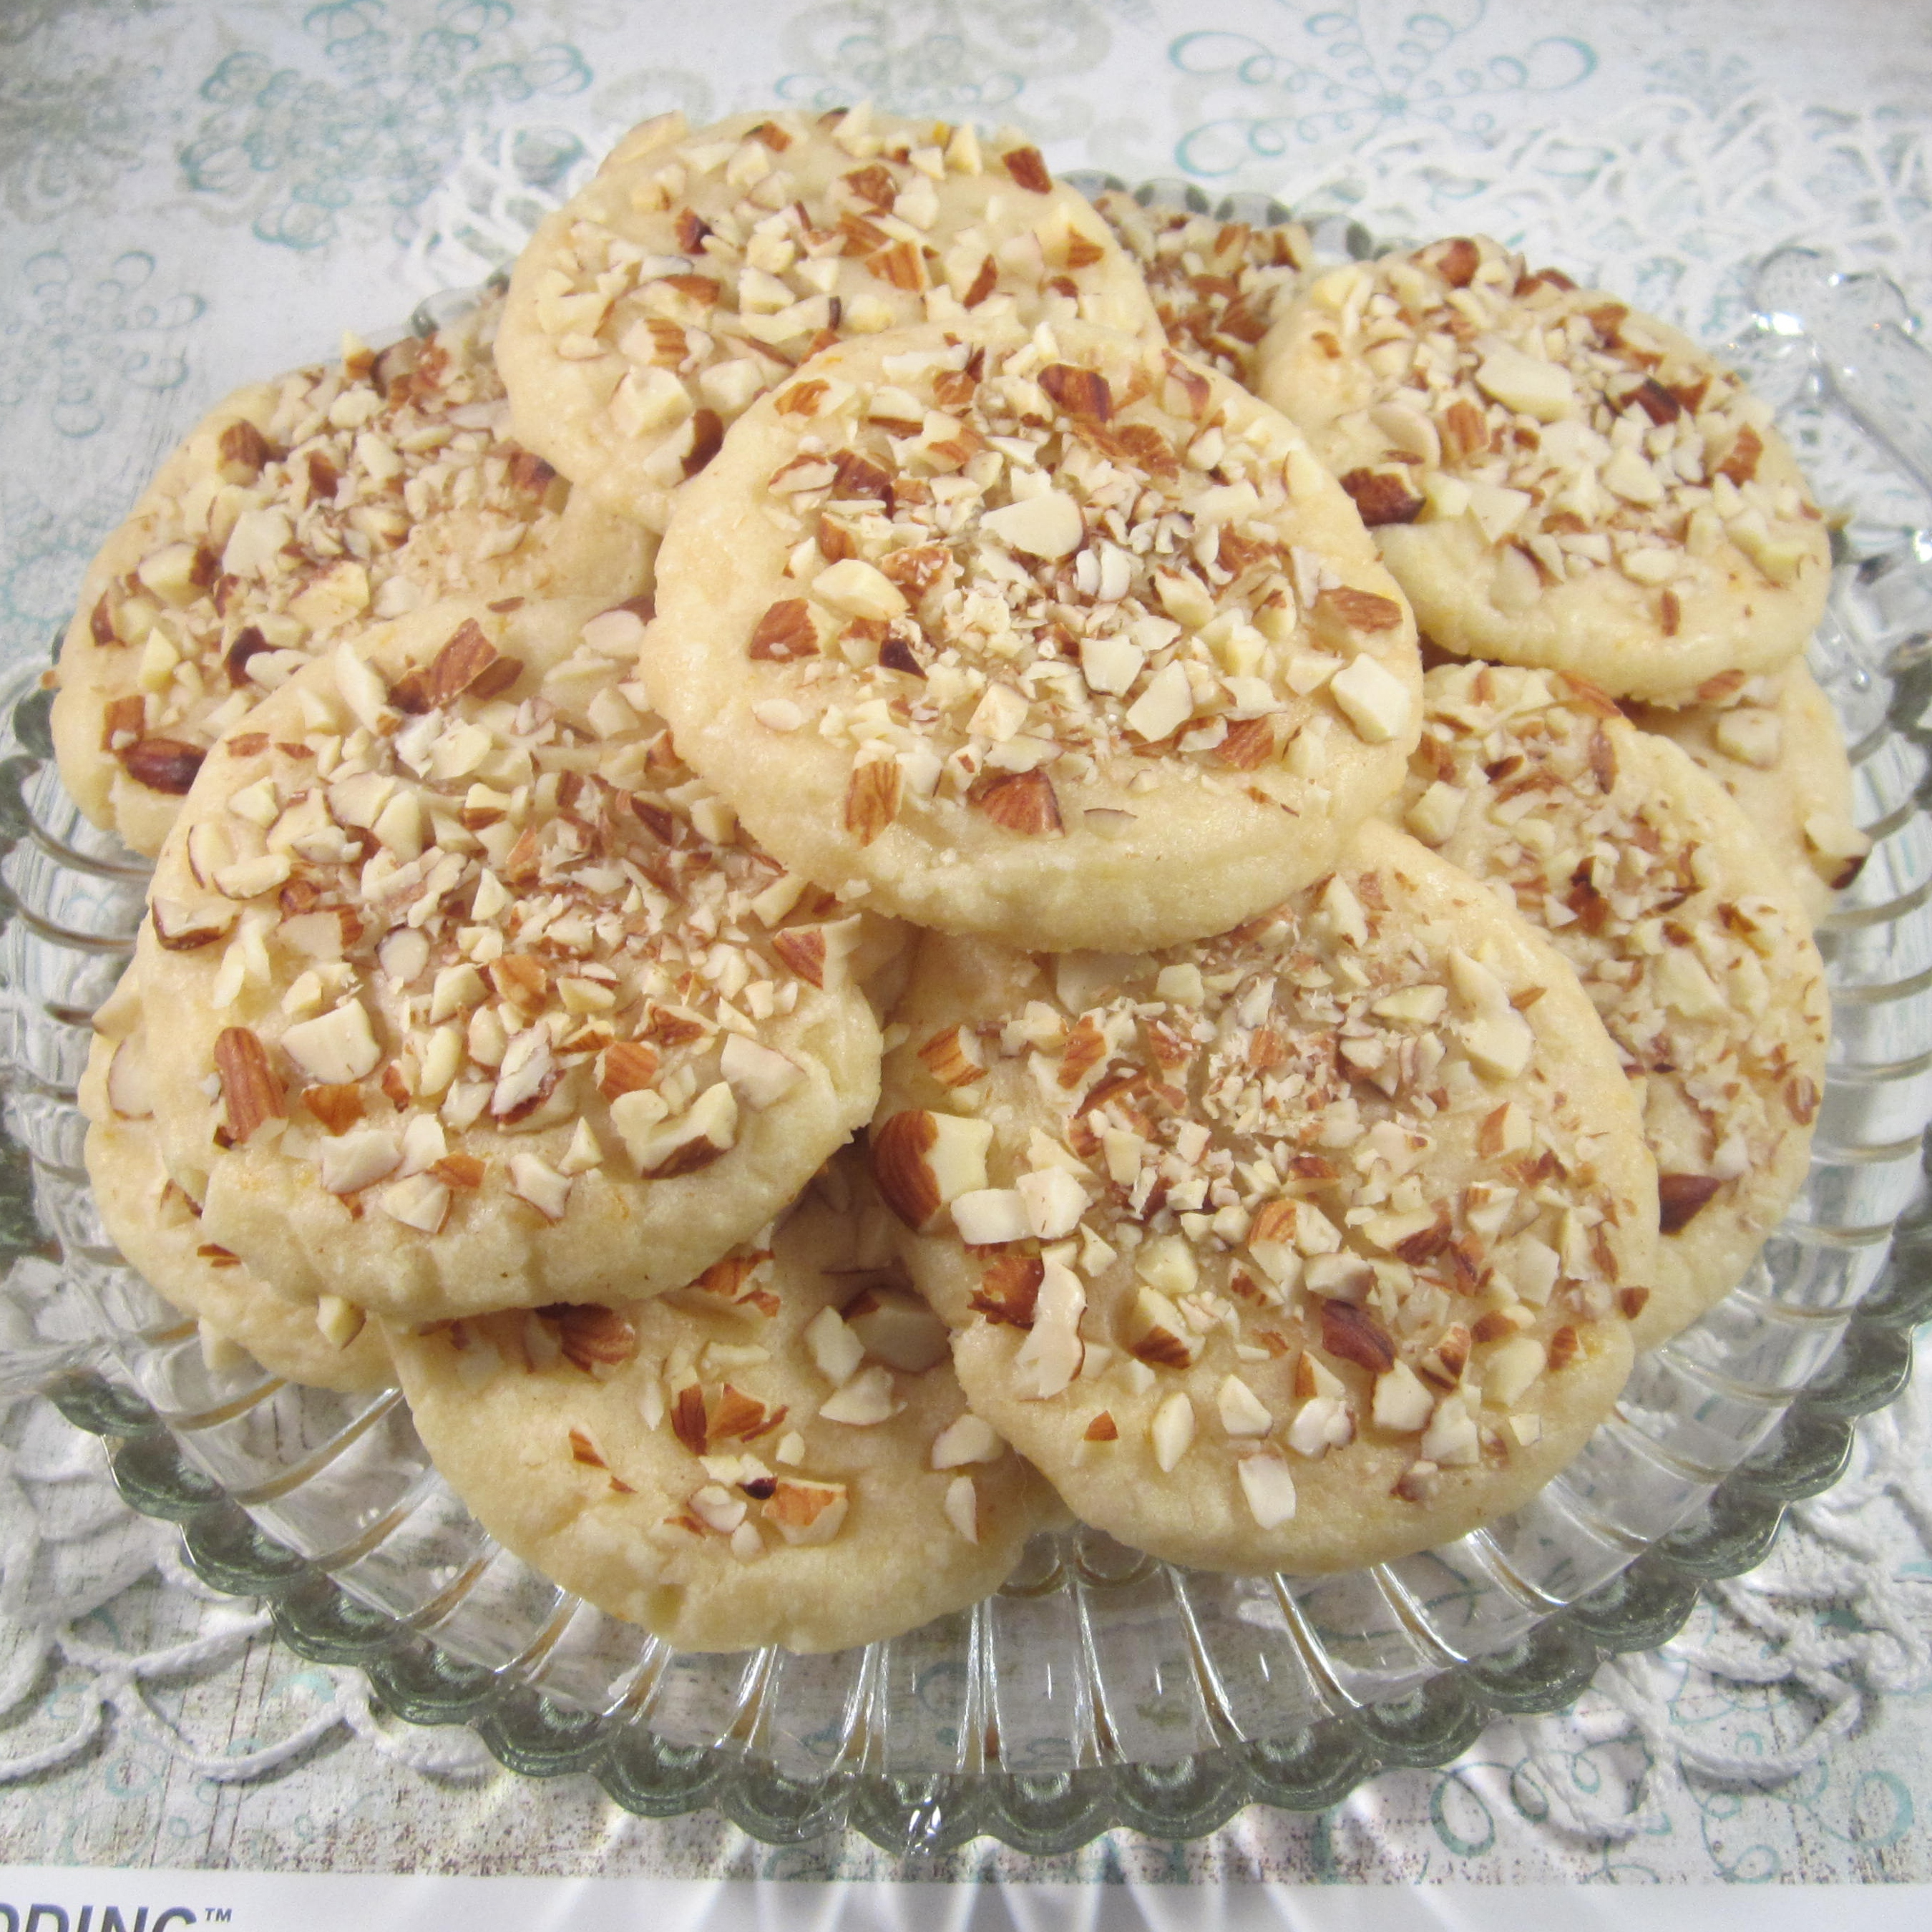 Amaretto Shortbread Cookie